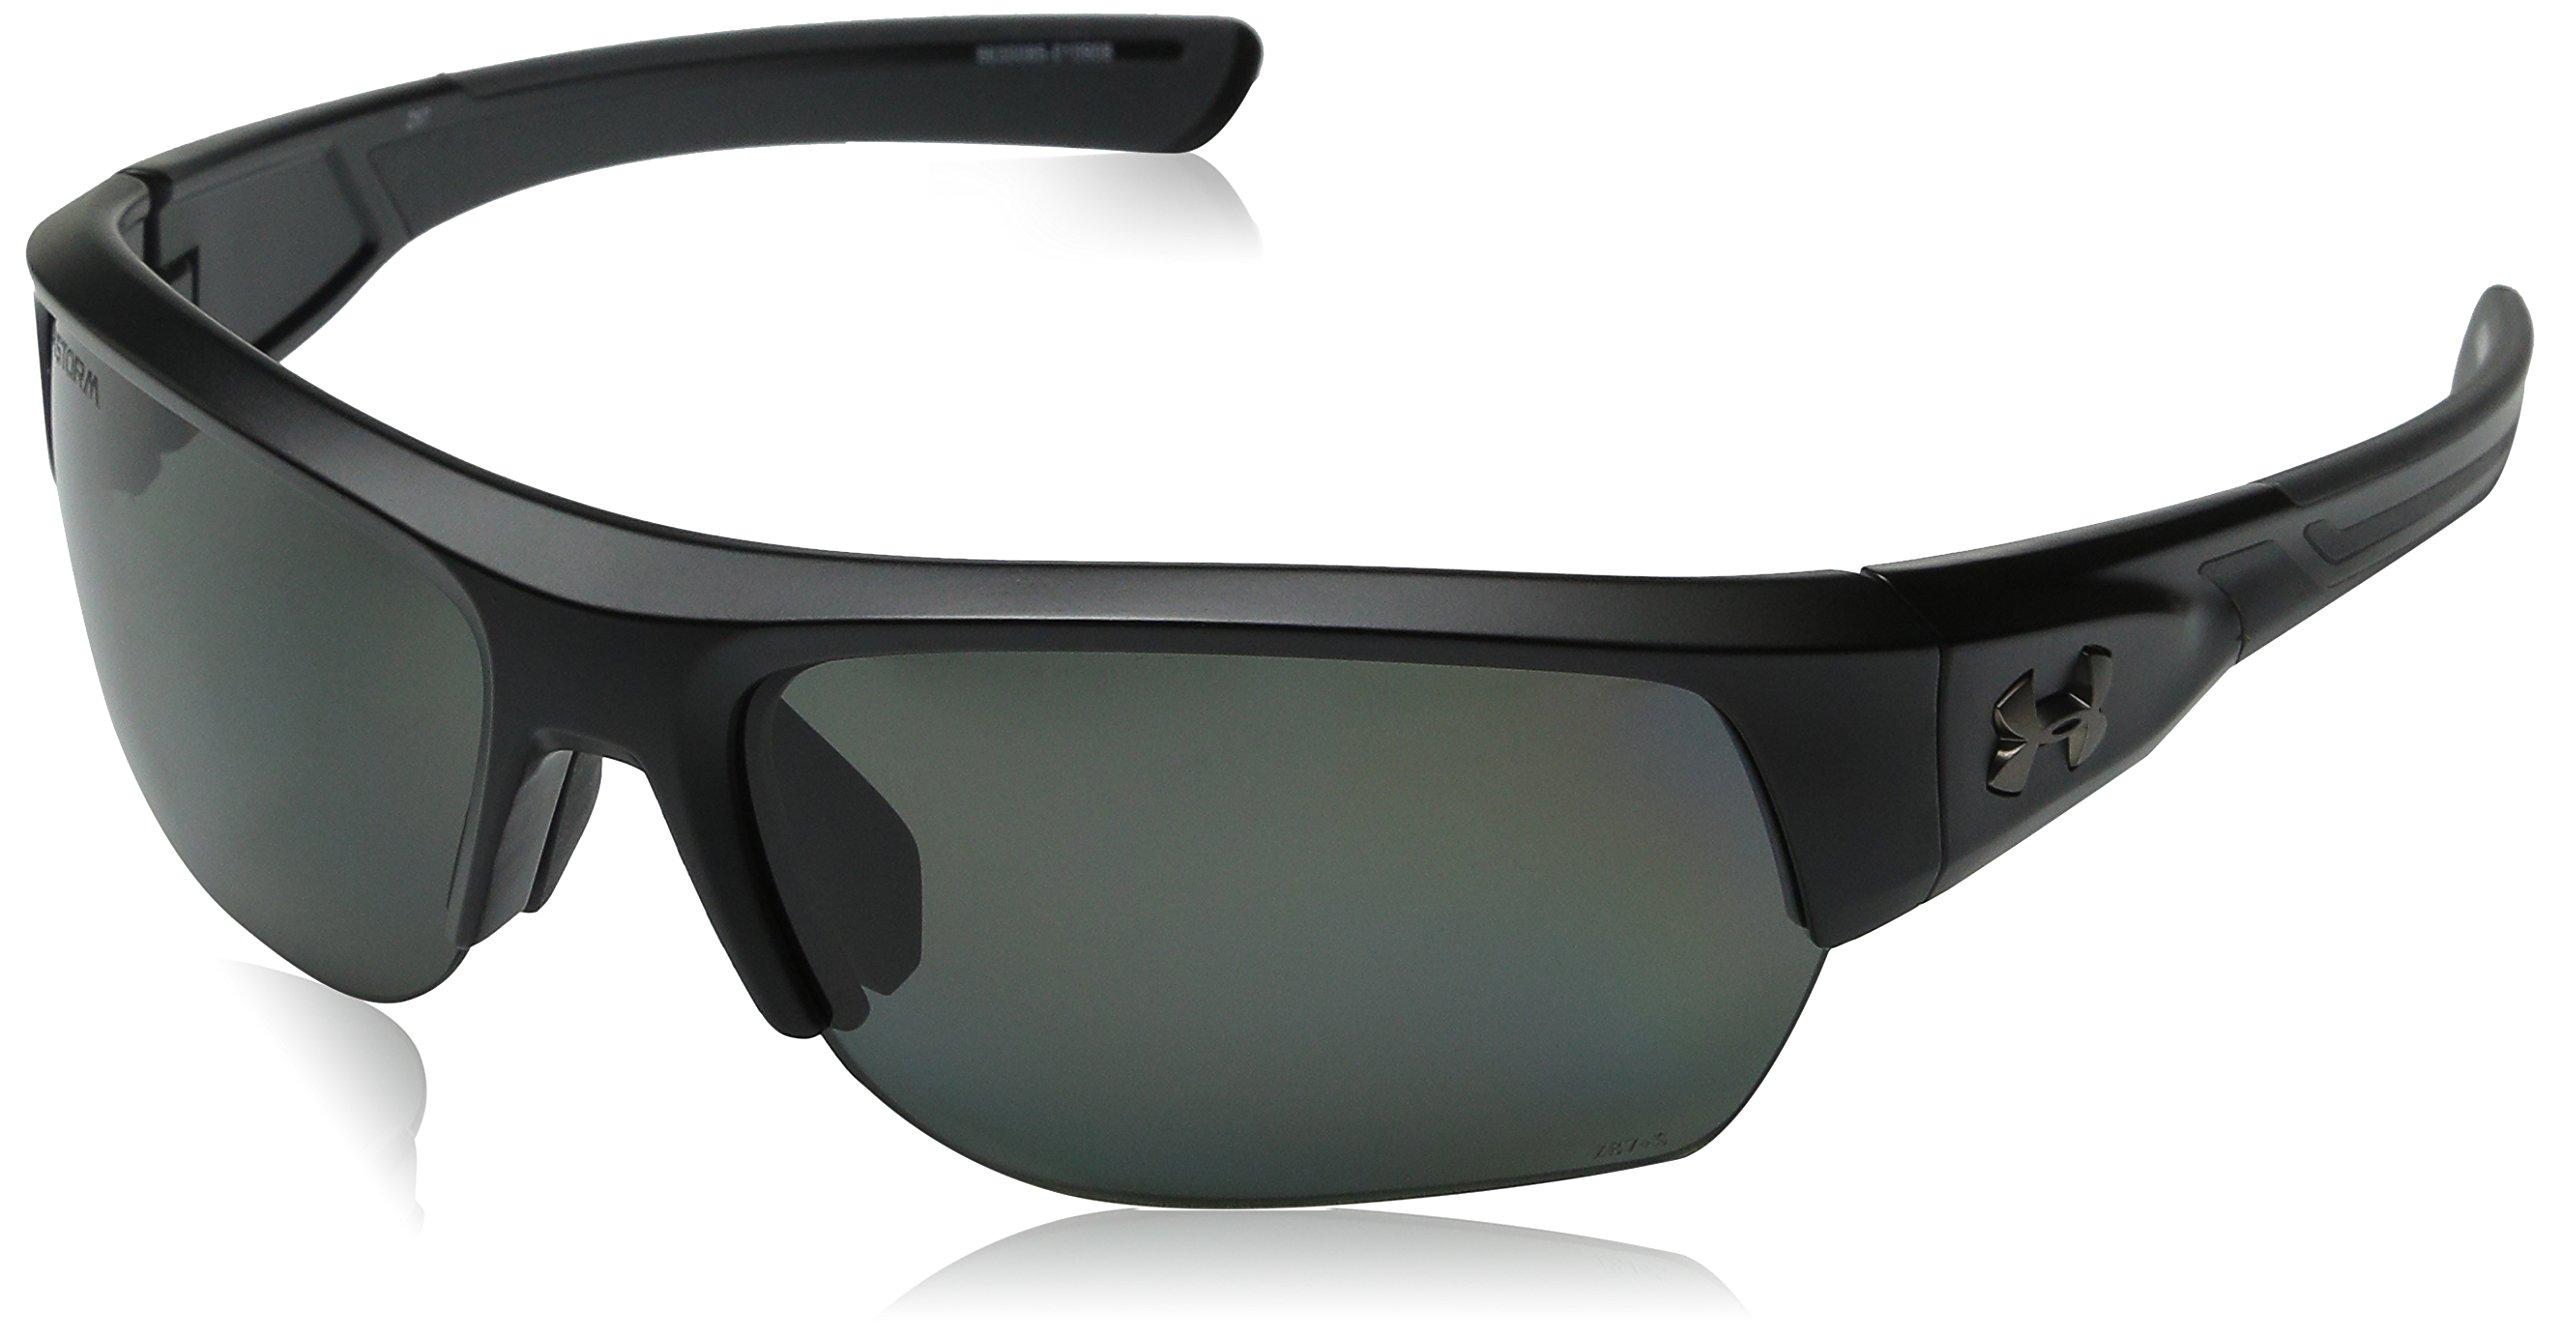 Under Armour Sunglasses Rectangular, UA Big Shot Storm (ANSI) Satin Black/Charcoal Frame/Gray Polarized Lens, 37 mm